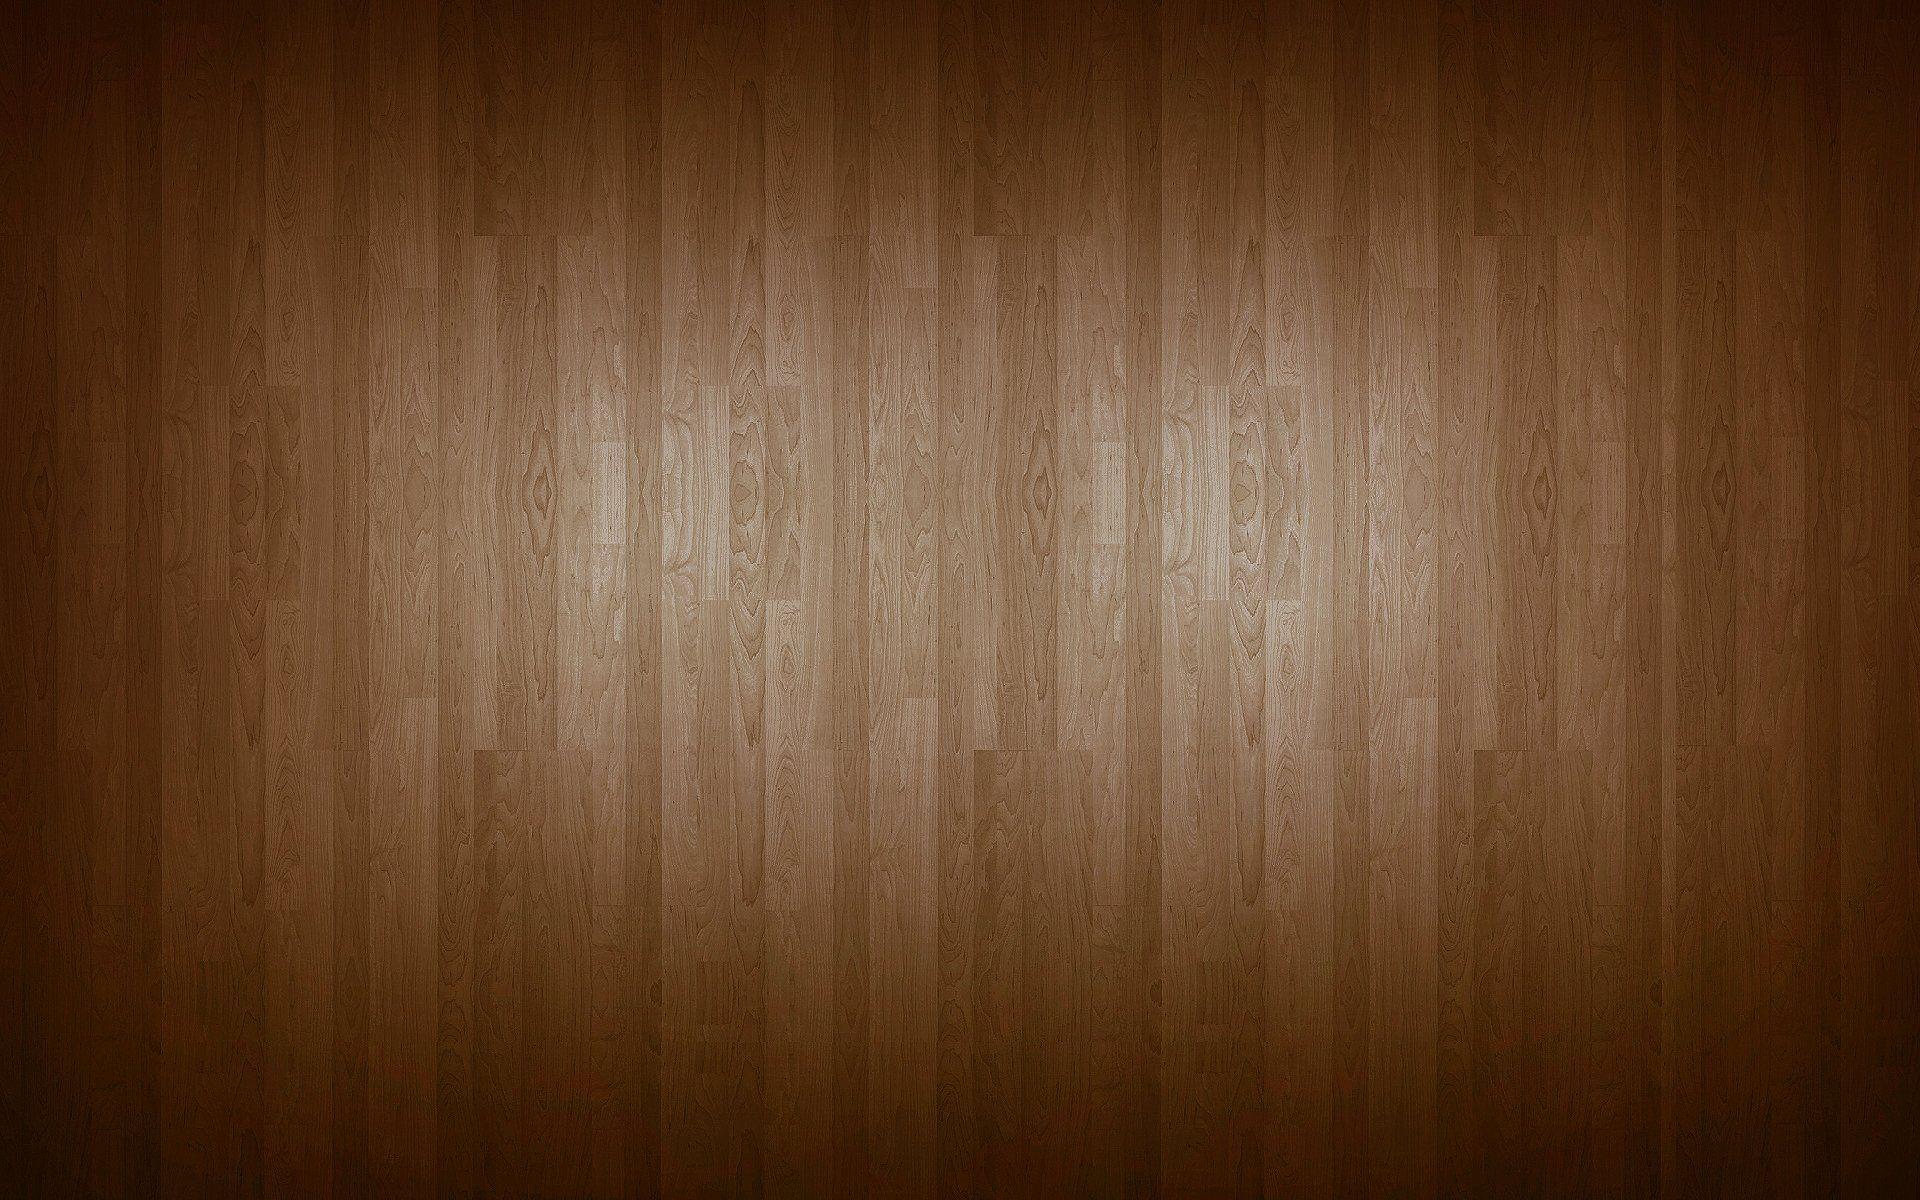 Download Wallpaper High Resolution Wood - 5123a346987f882270531ee395d4128b  Pic_674785.jpg